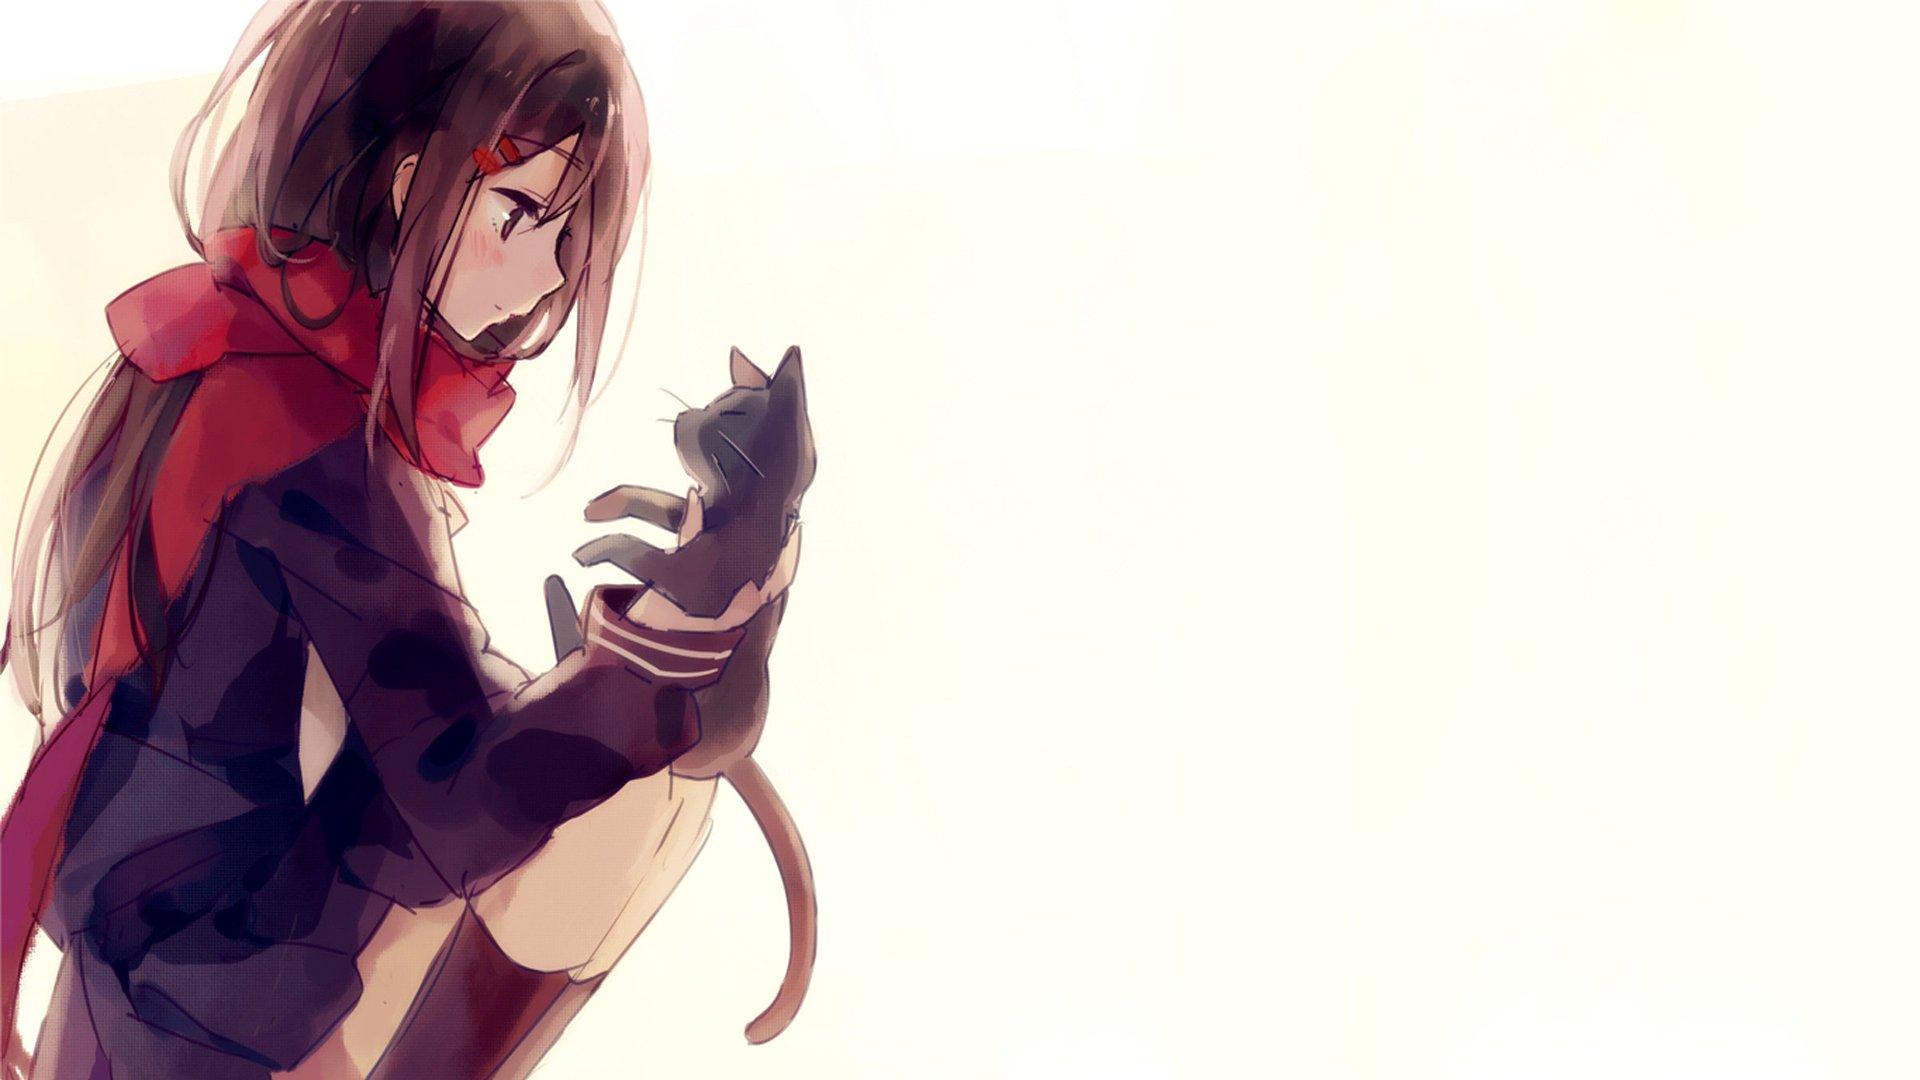 Wallpaper 1920x1080 Px Anime Cat Cute Girl Kagerou Project Series 1920x1080 Wallbase 1905563 Hd Wallpapers Wallhere